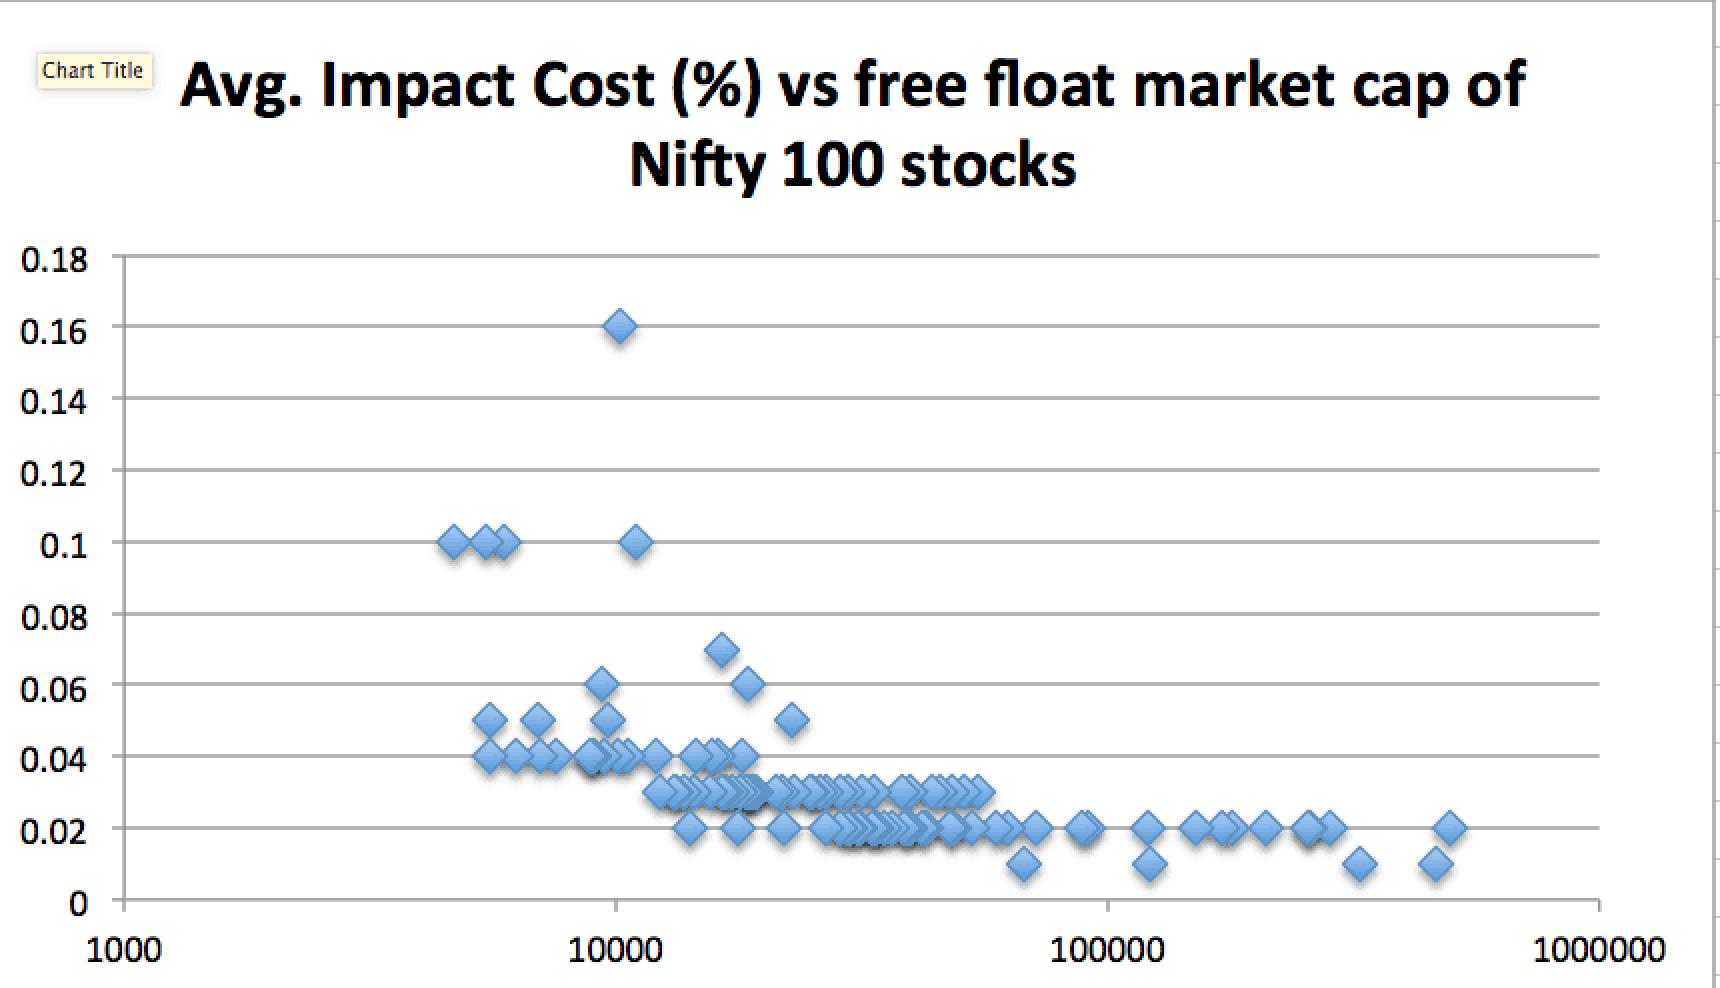 Impact cost vs Free float market cap of NIfty 100 stocks